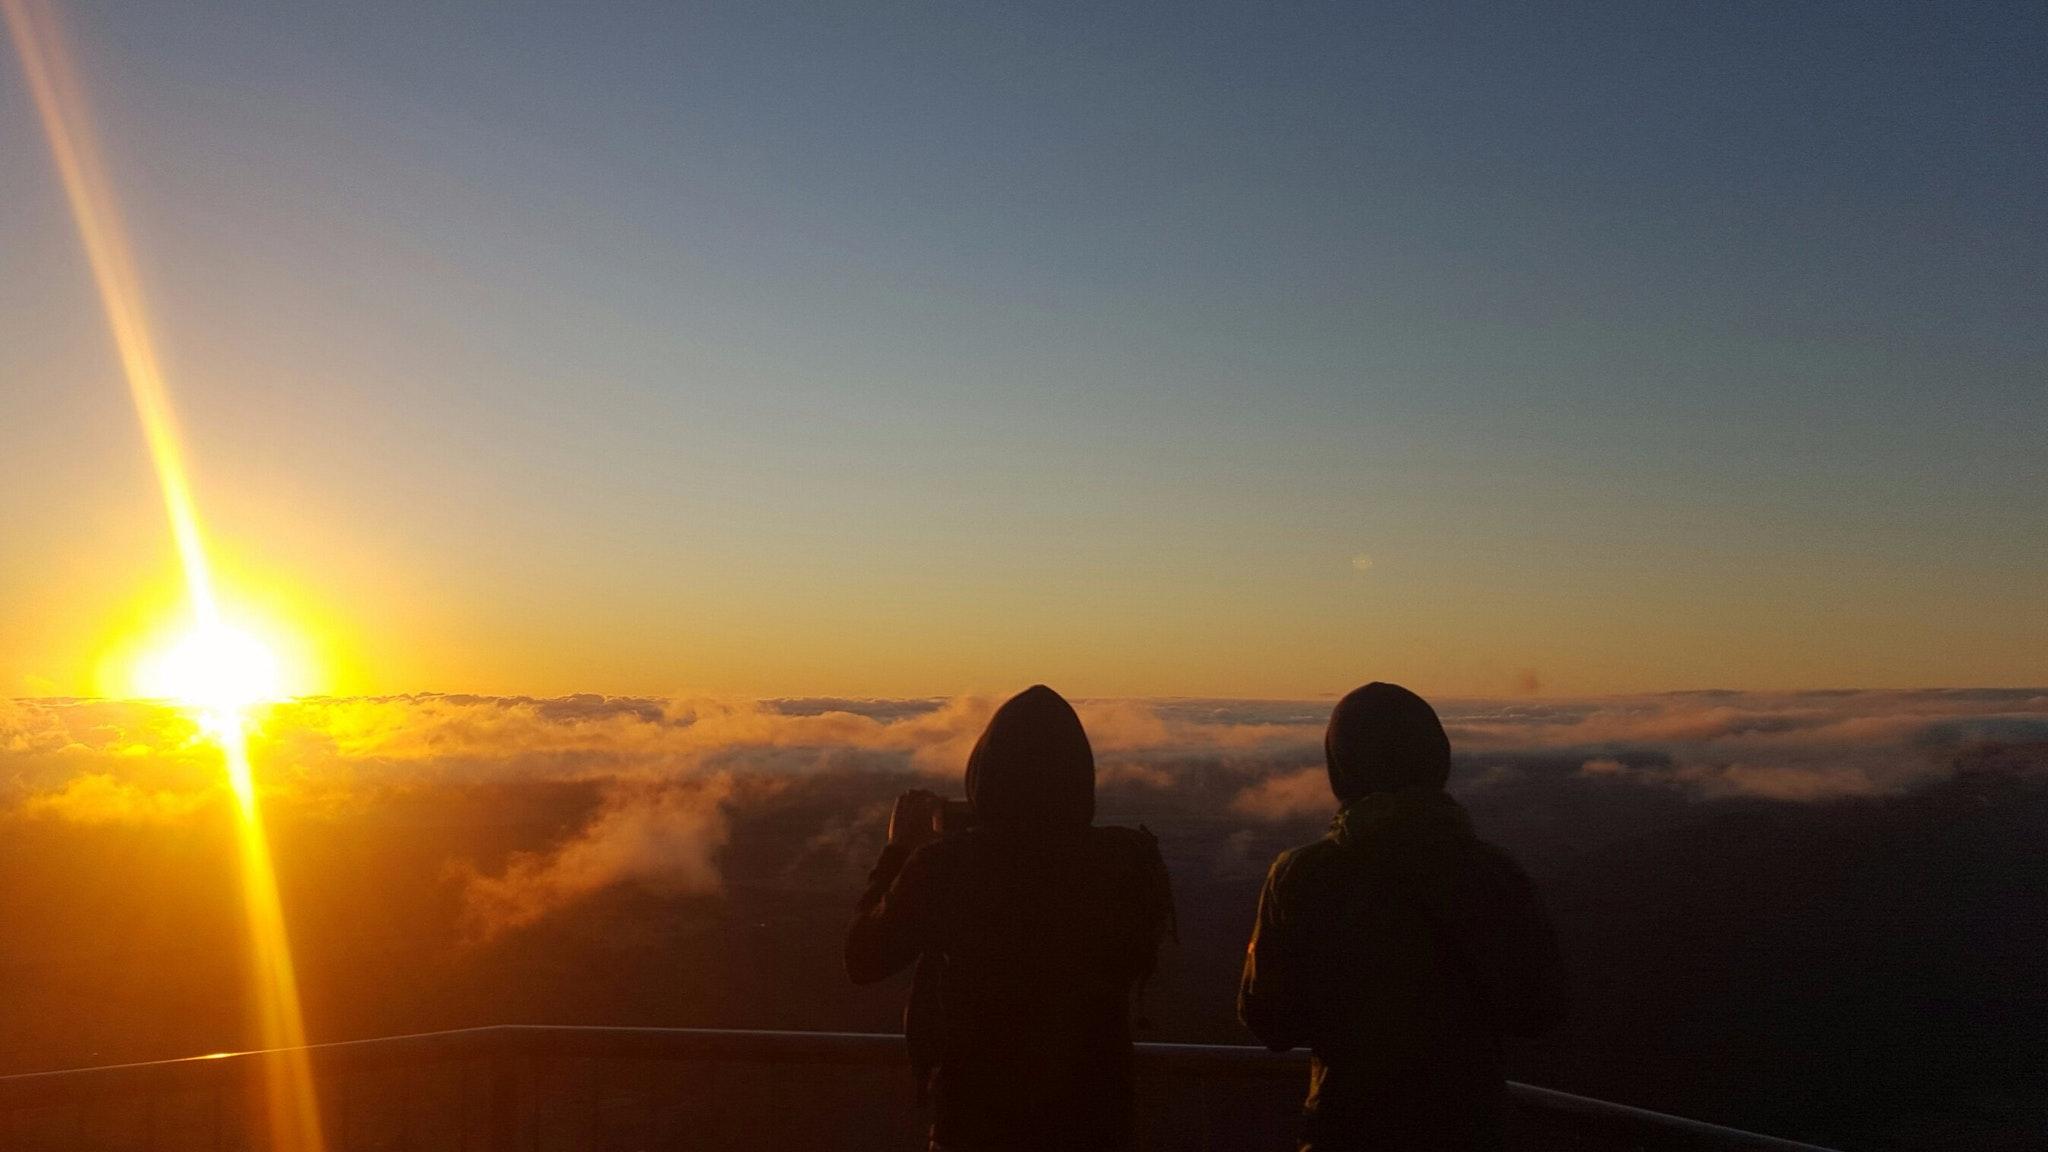 Sunrise in the Grampians National Park